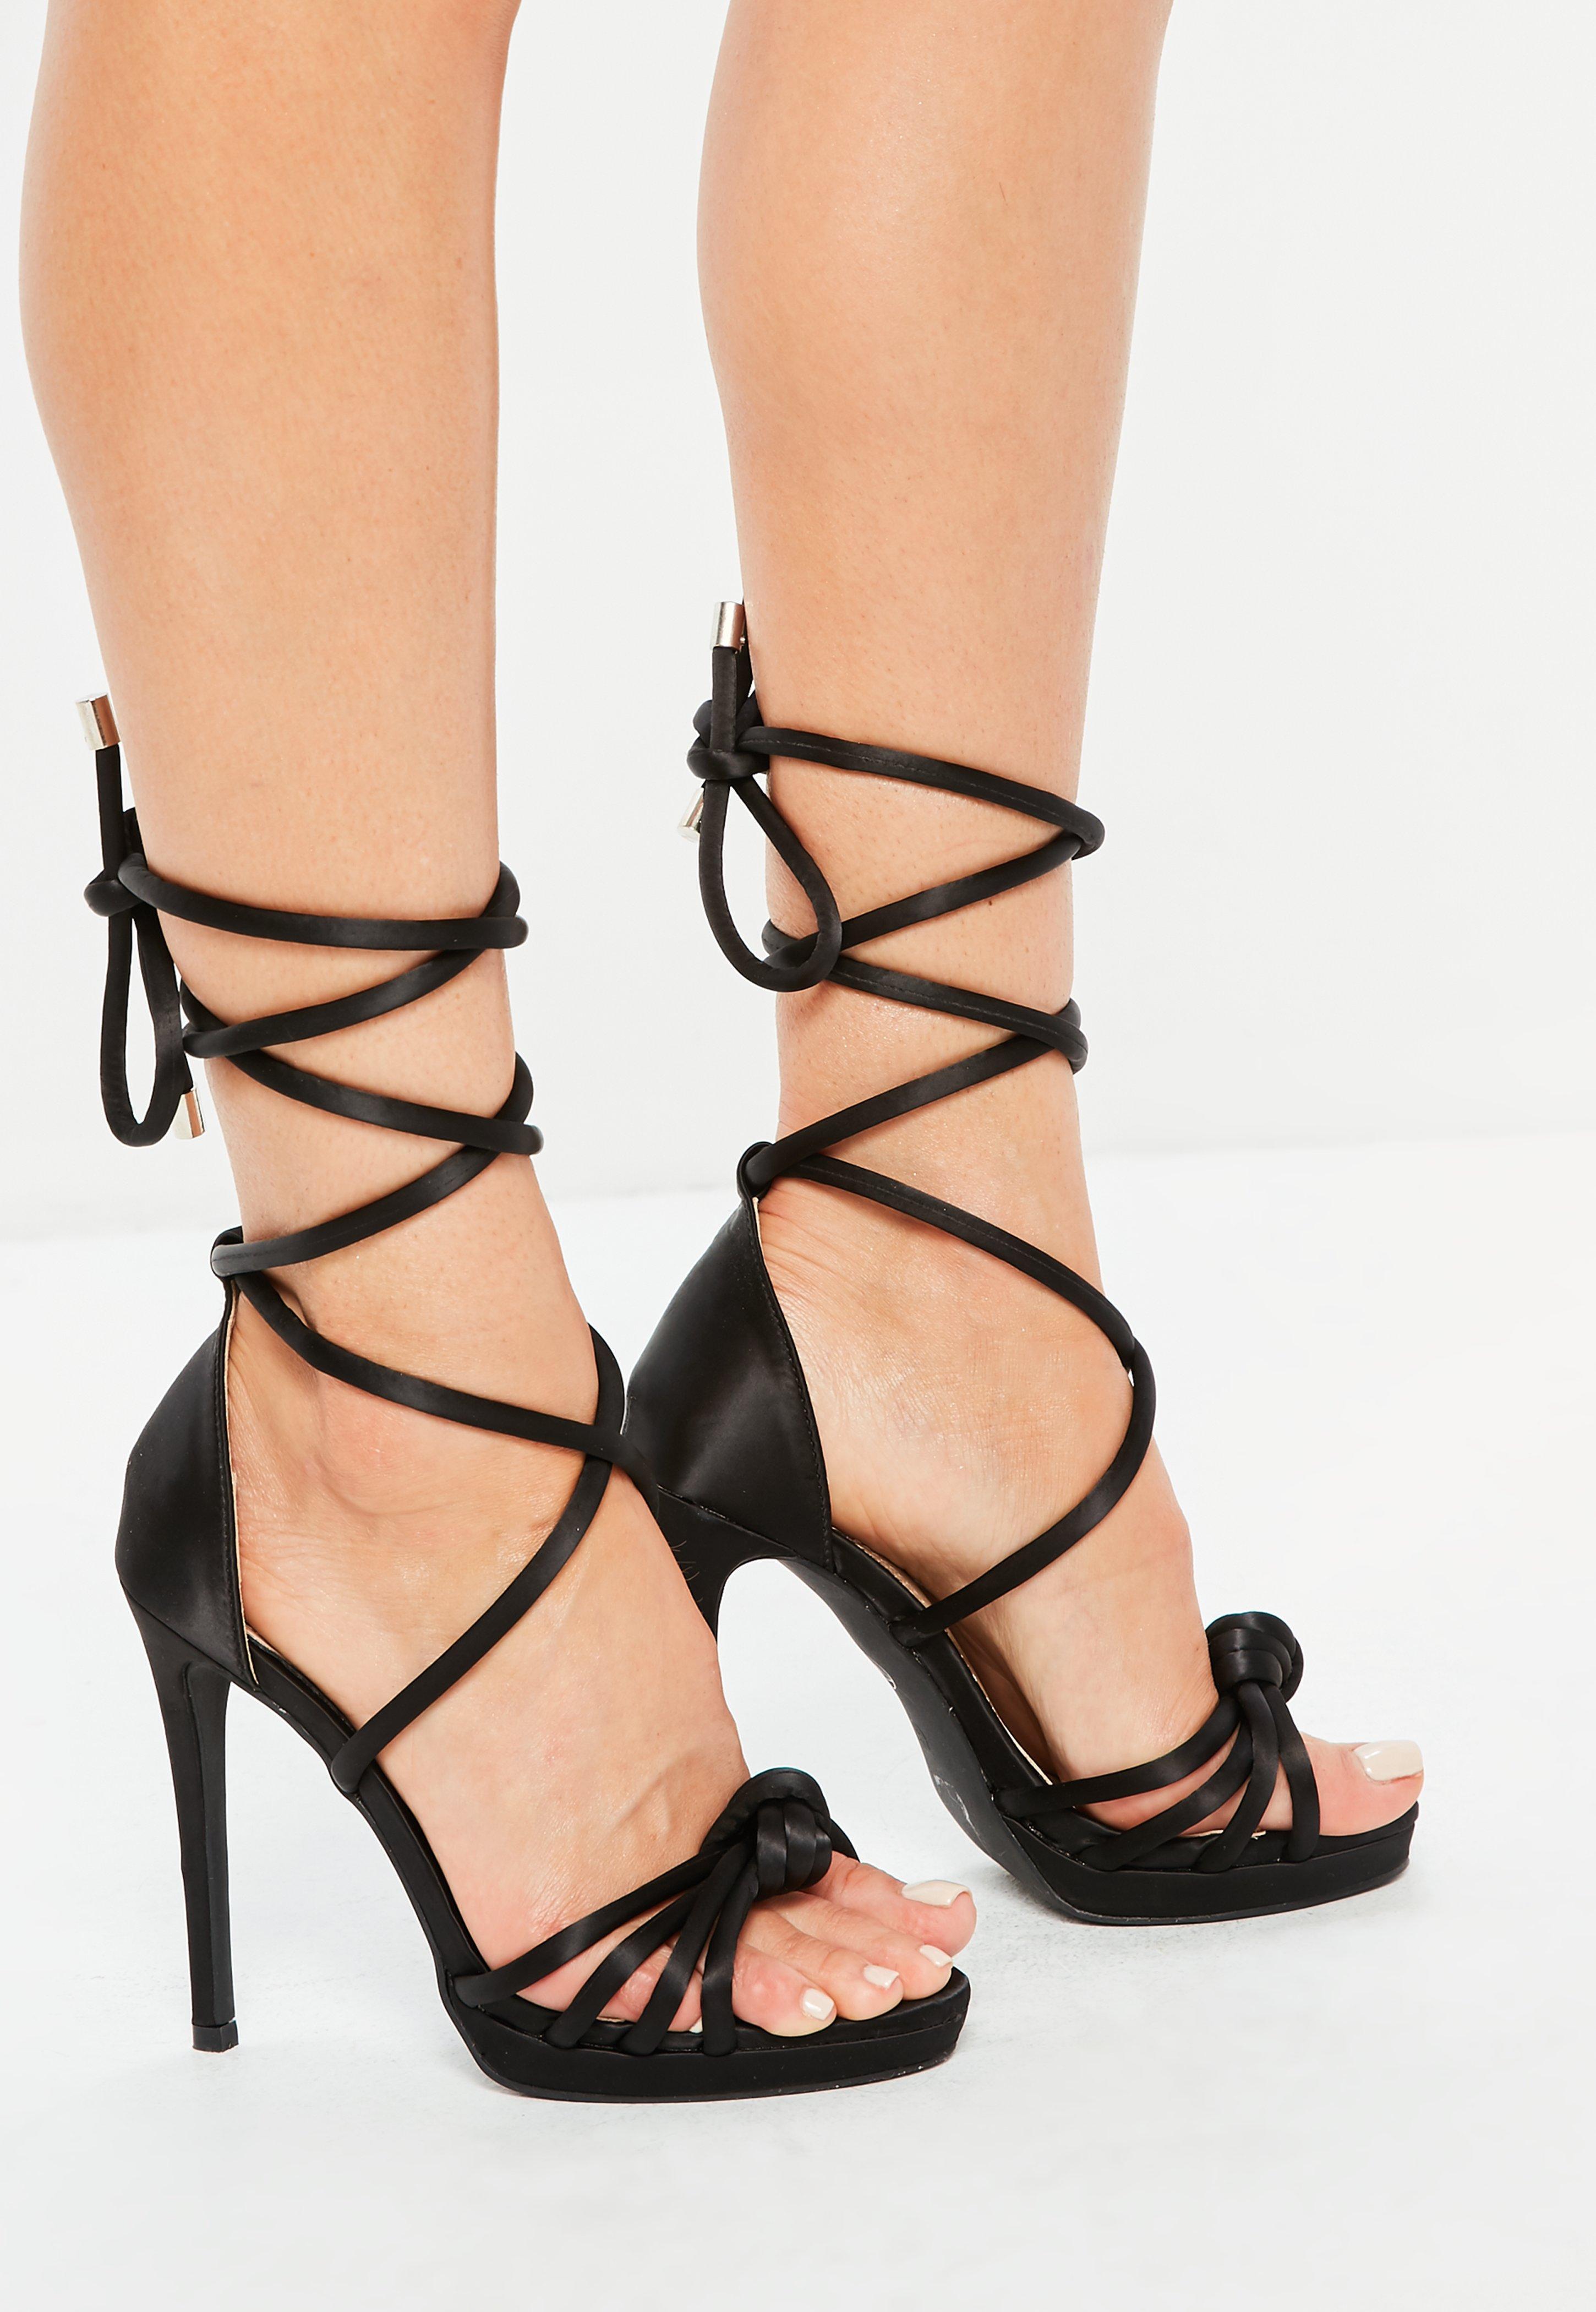 e7fcb1bbee0 Prom Shoes